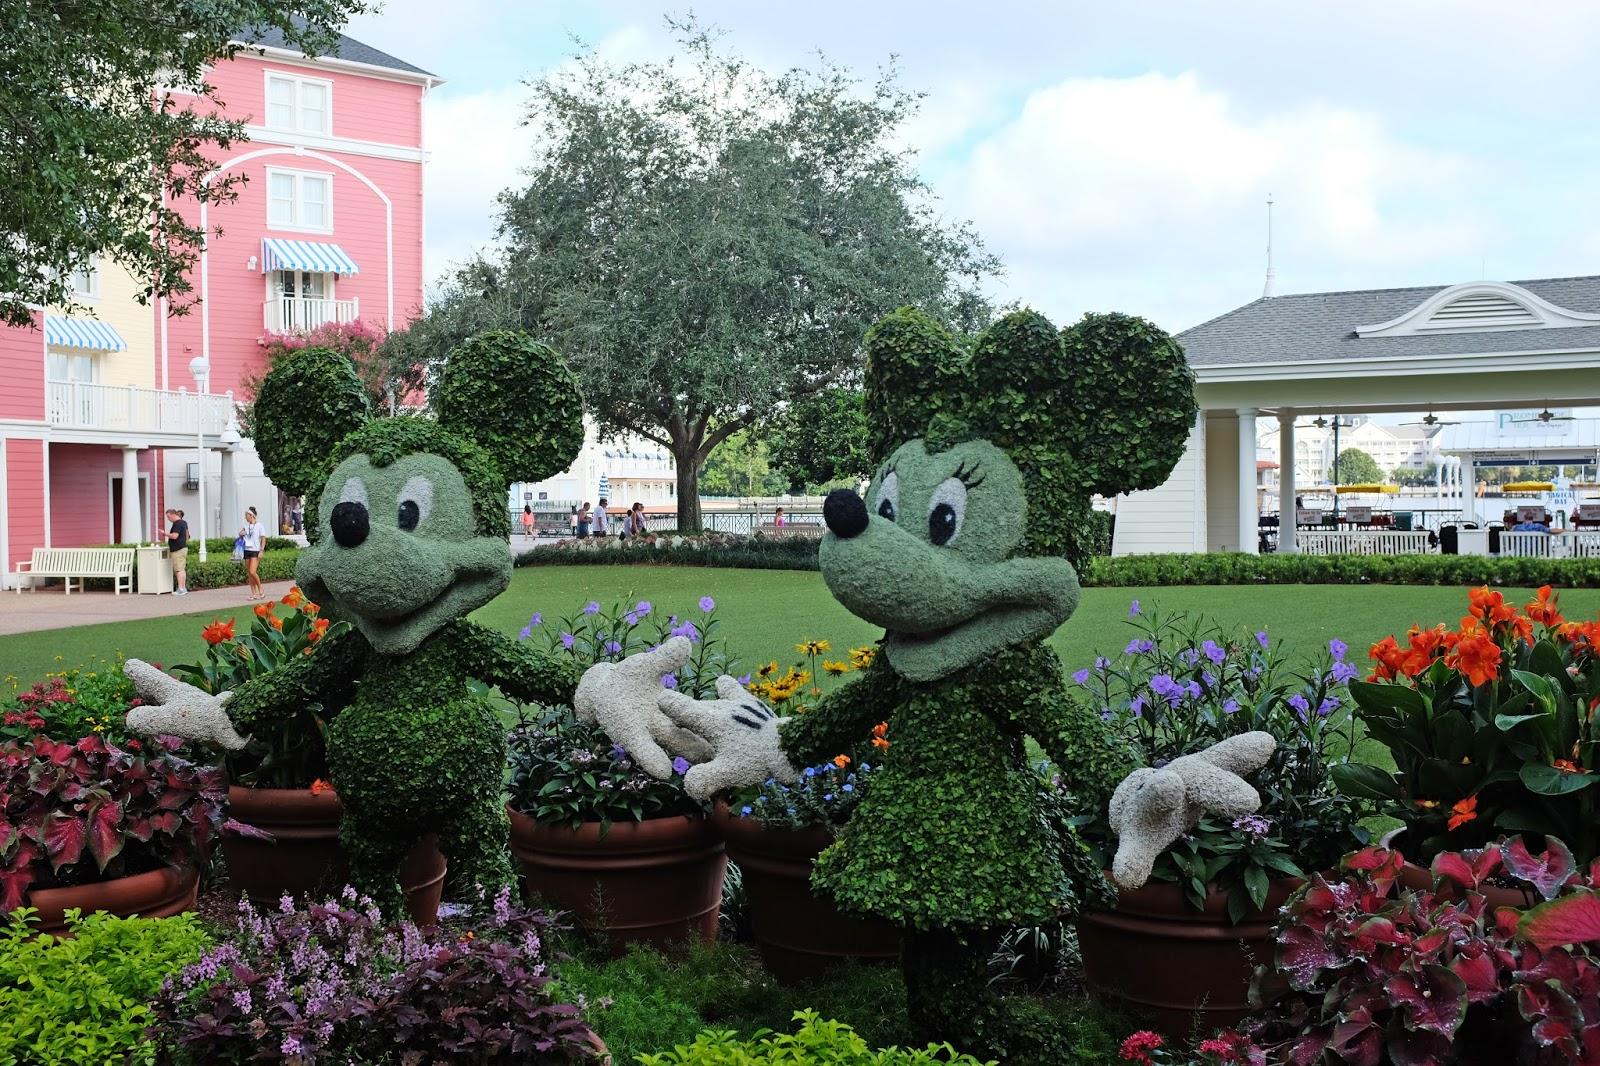 The Boardwalk at Walt Disney World, Florida